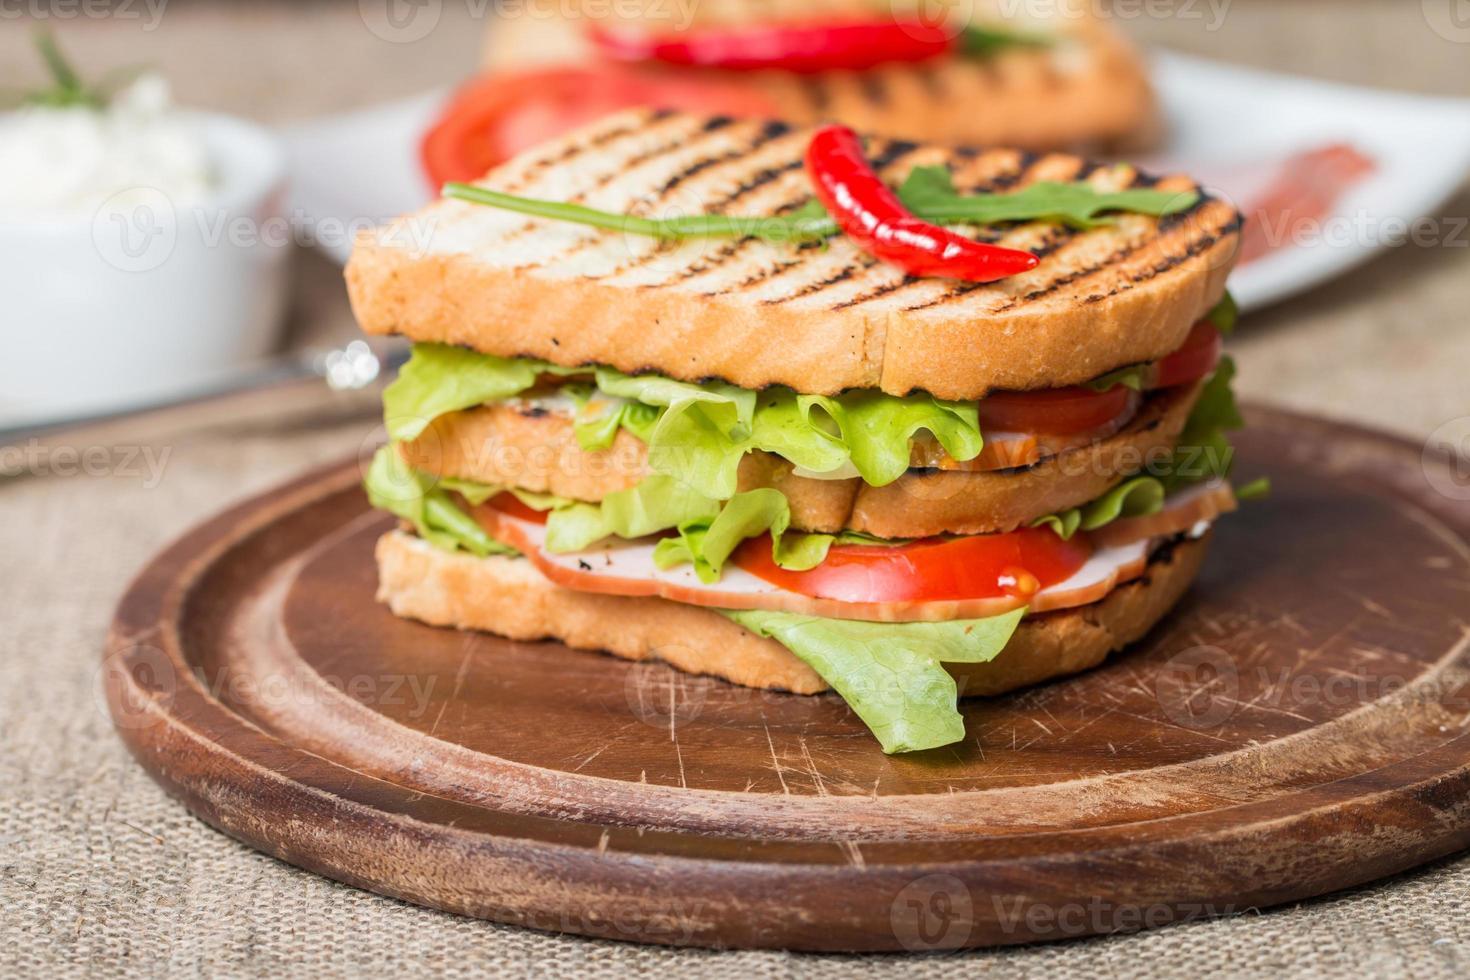 klassieke clubsandwich met spek en groenten foto